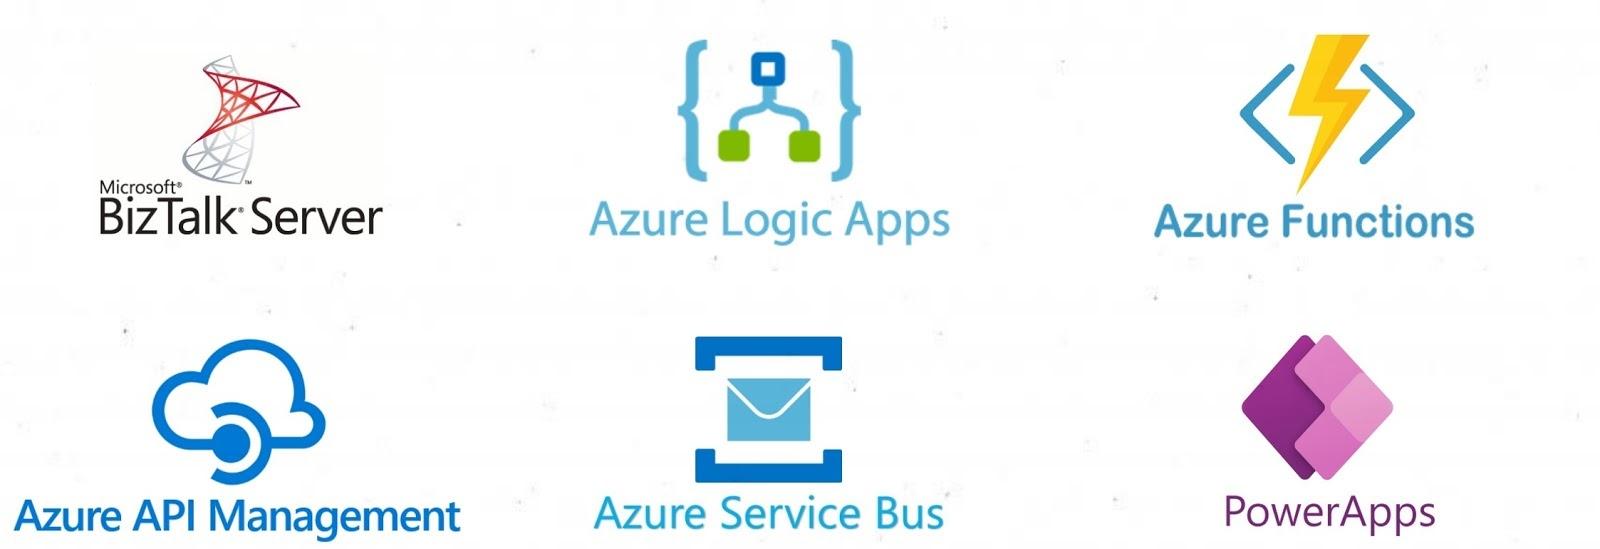 August 30, 2021 Weekly Update on Microsoft Integration Platform & Azure iPaaS